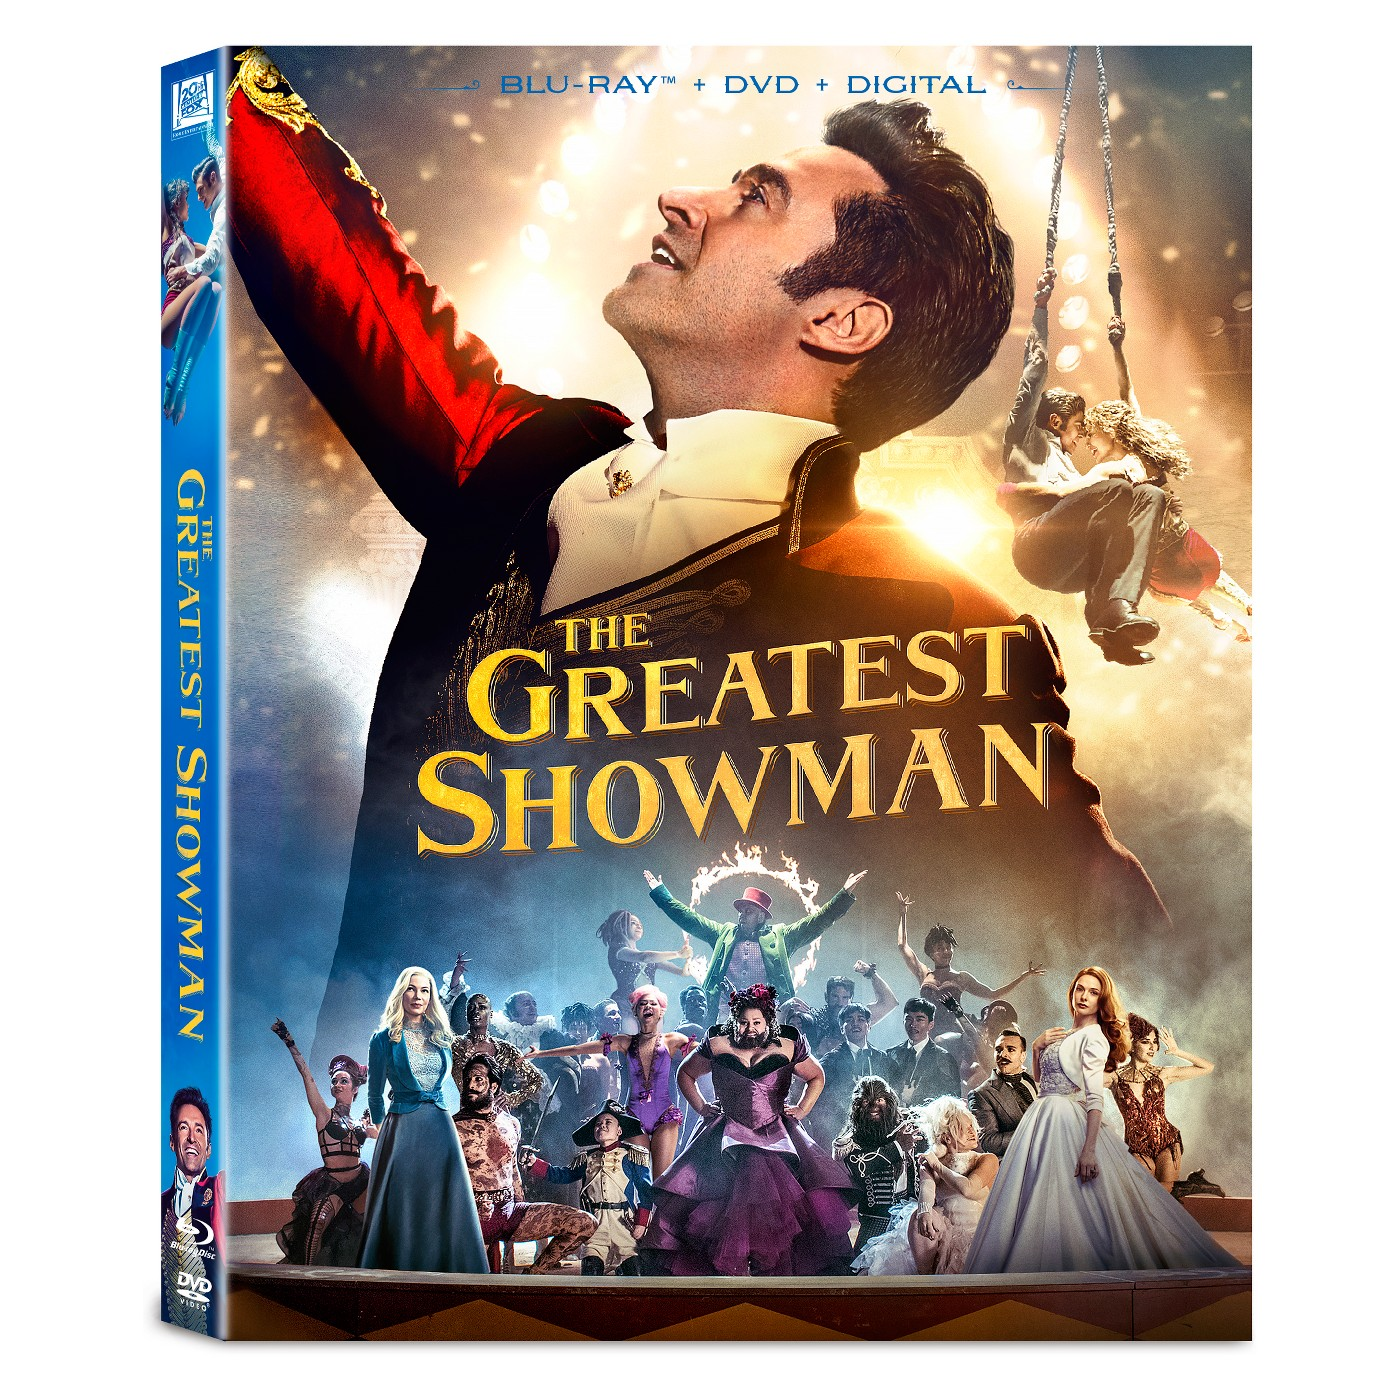 The Greatest Showman (Blu-ray + DVD + Digital) - image 1 of 1